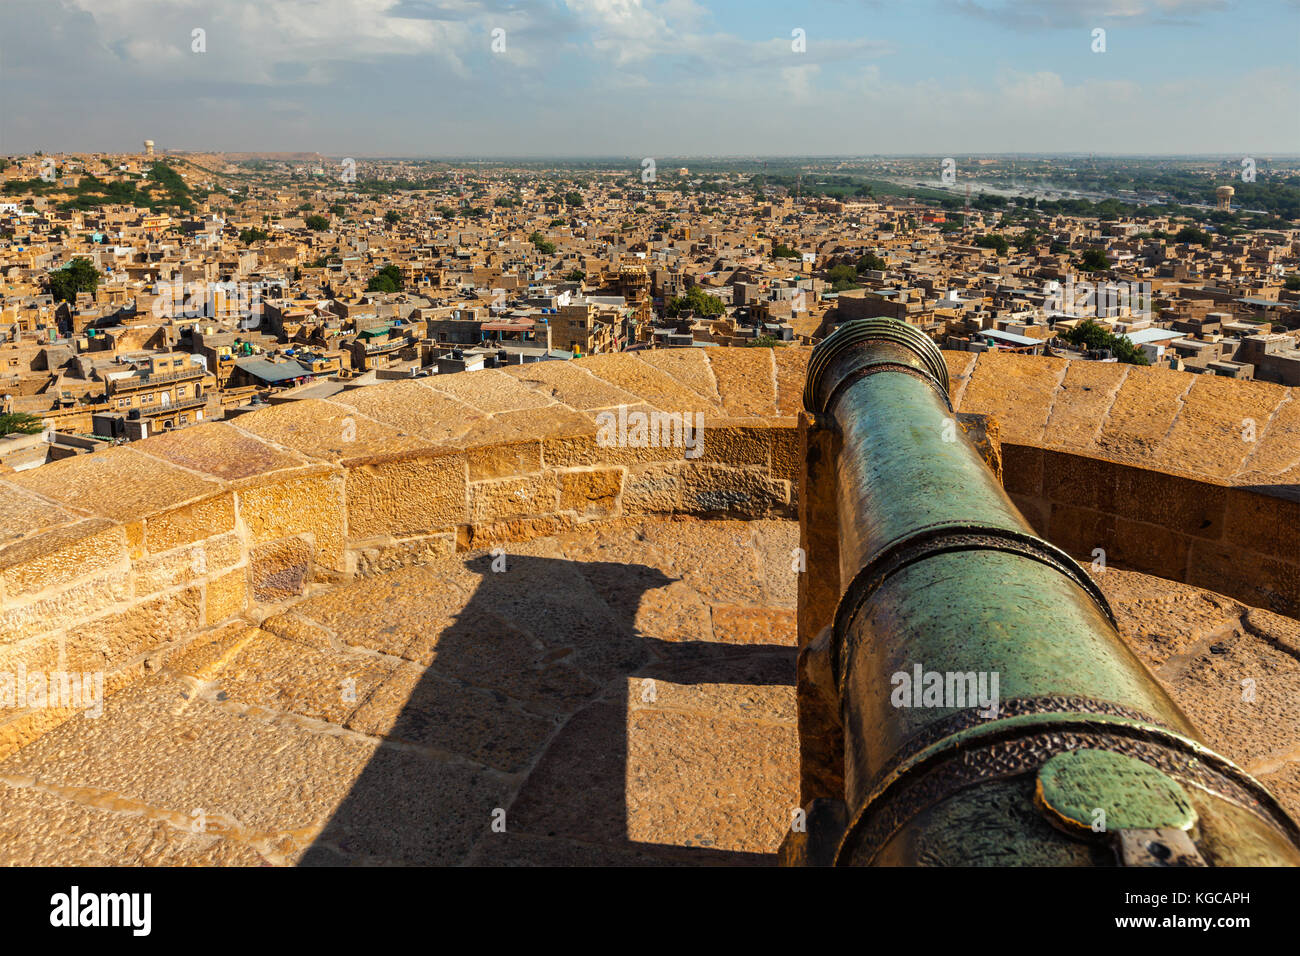 View of Jaisalmer city from Jaisalmer fort, Rajasthan, India - Stock Image